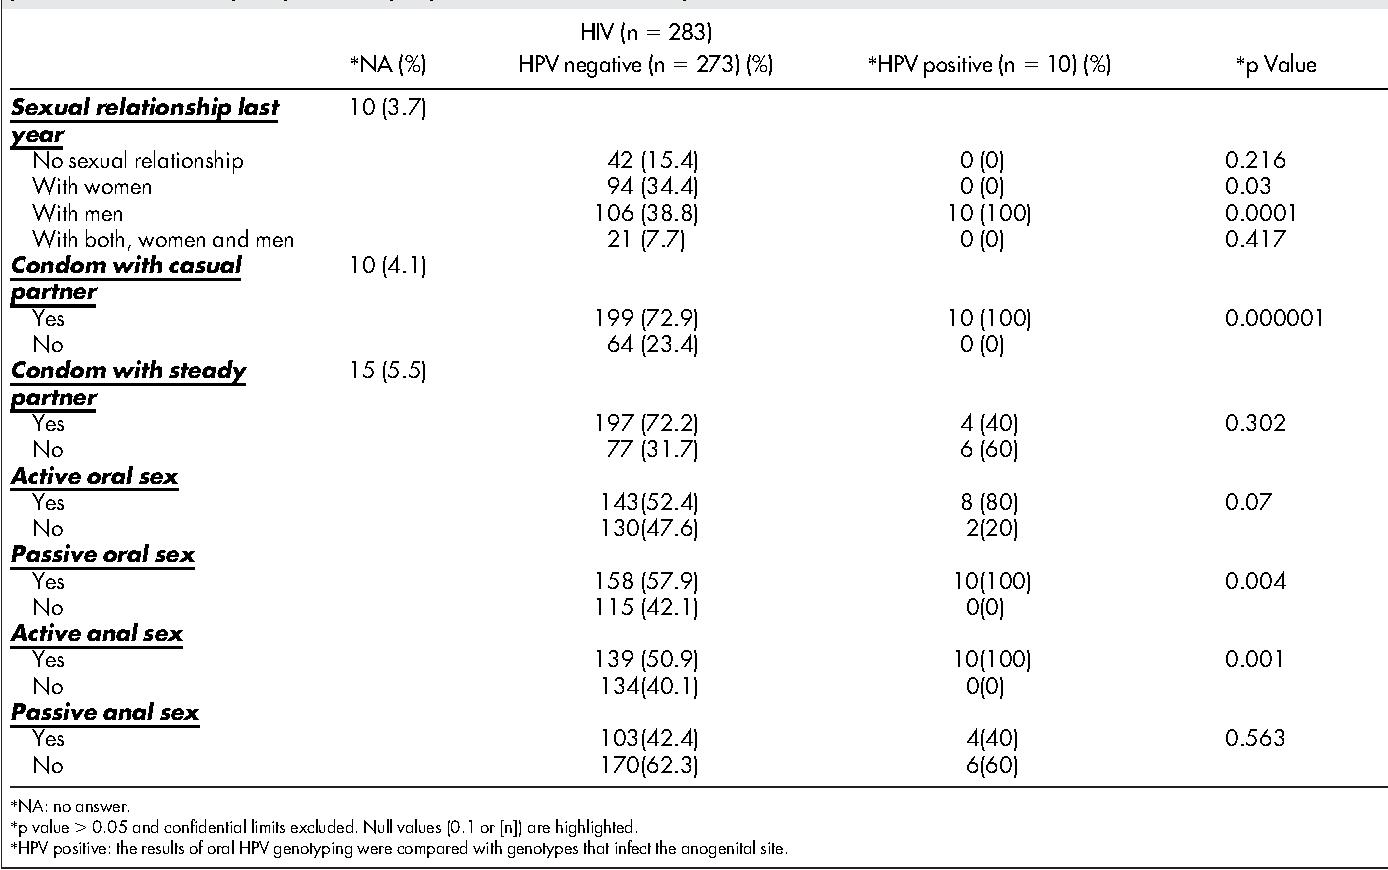 human papillomavirus infection positive 4 colorectal cancer